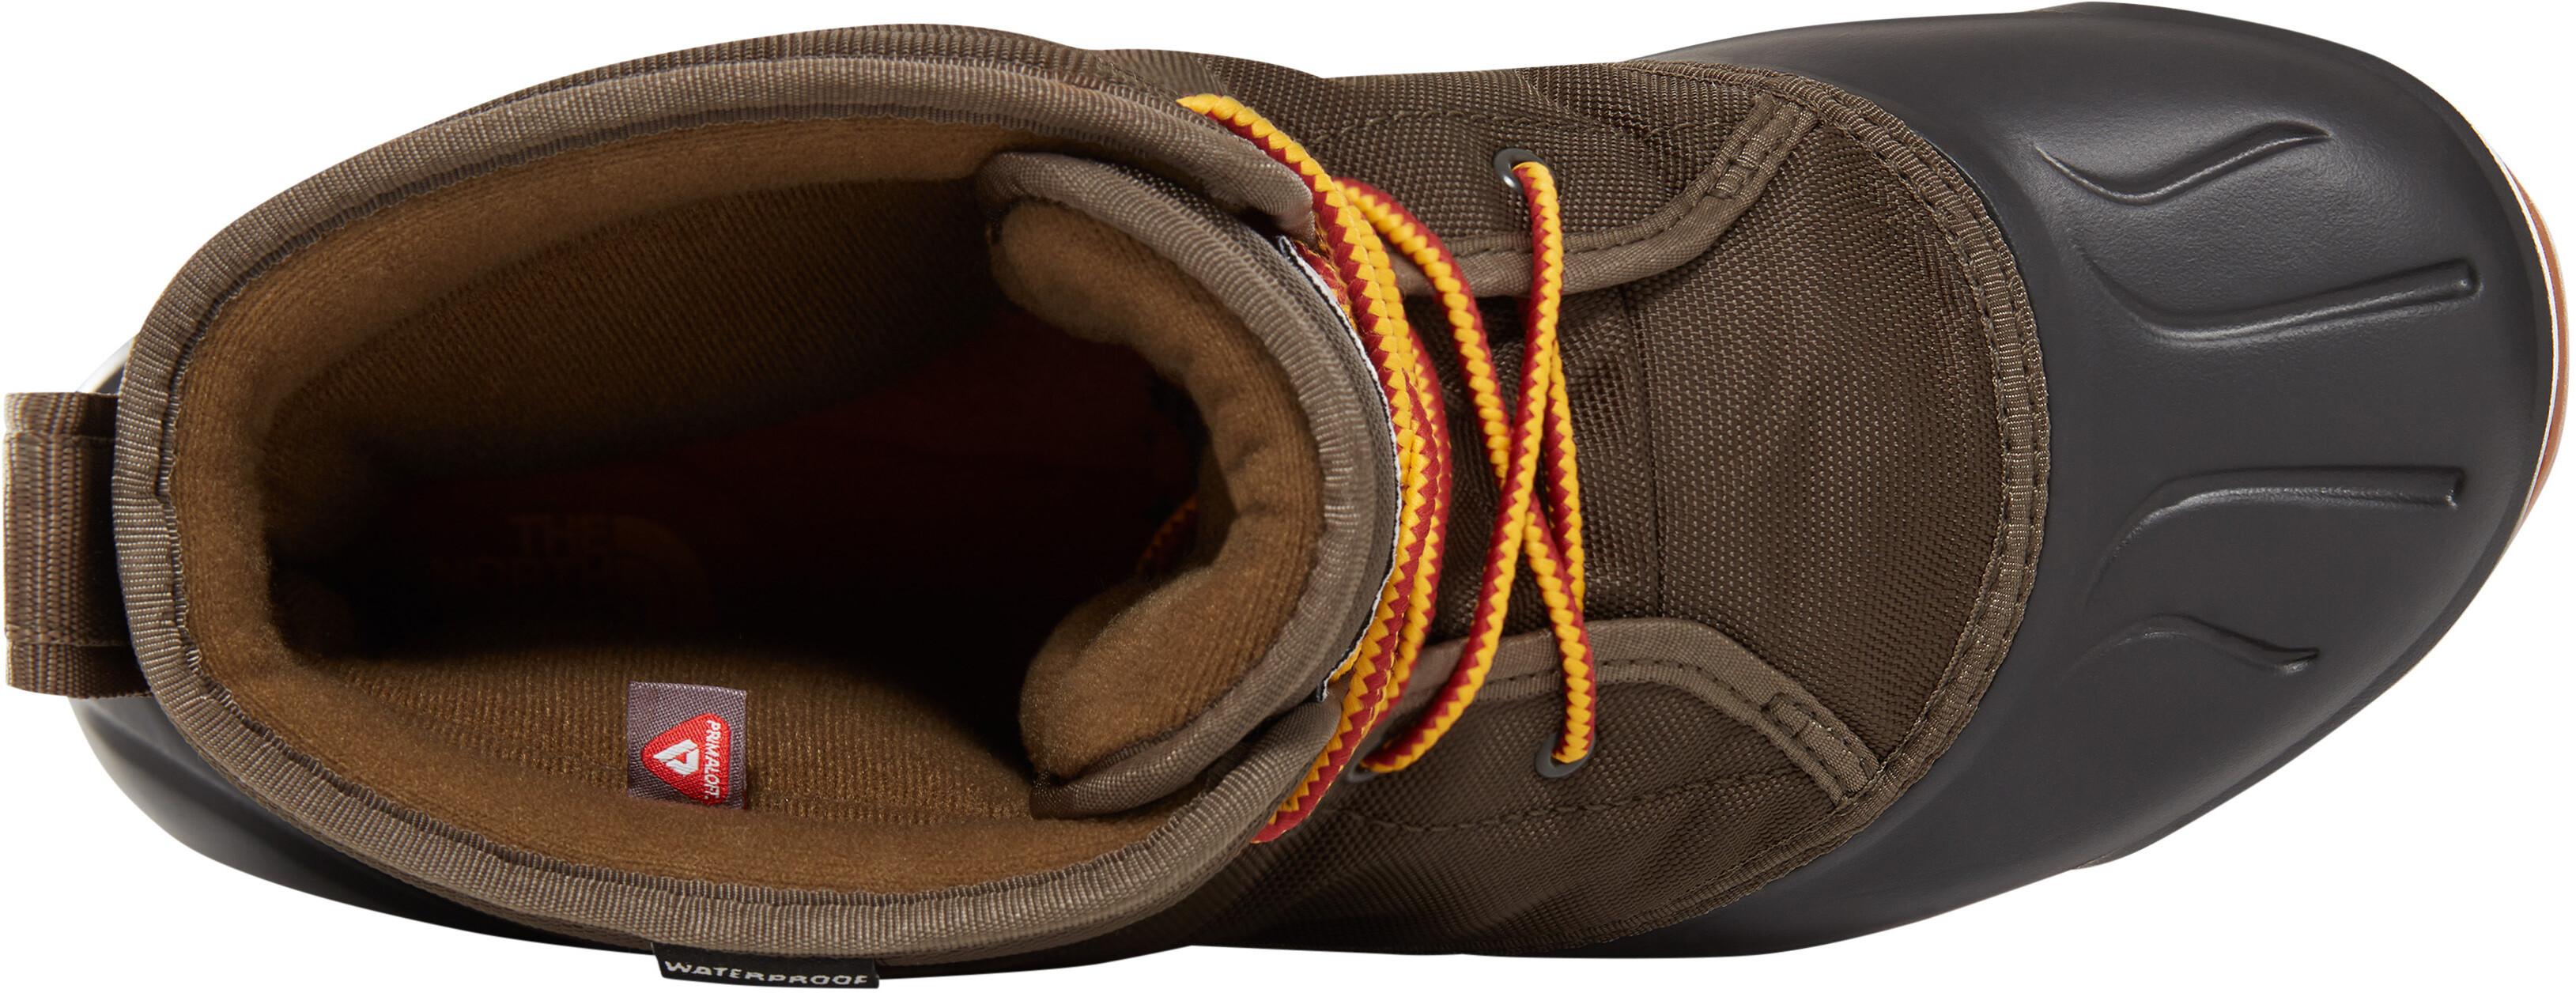 61cf06c6f8 The North Face Tsumoru Boots Men tarmac green/tnf black at Addnature ...